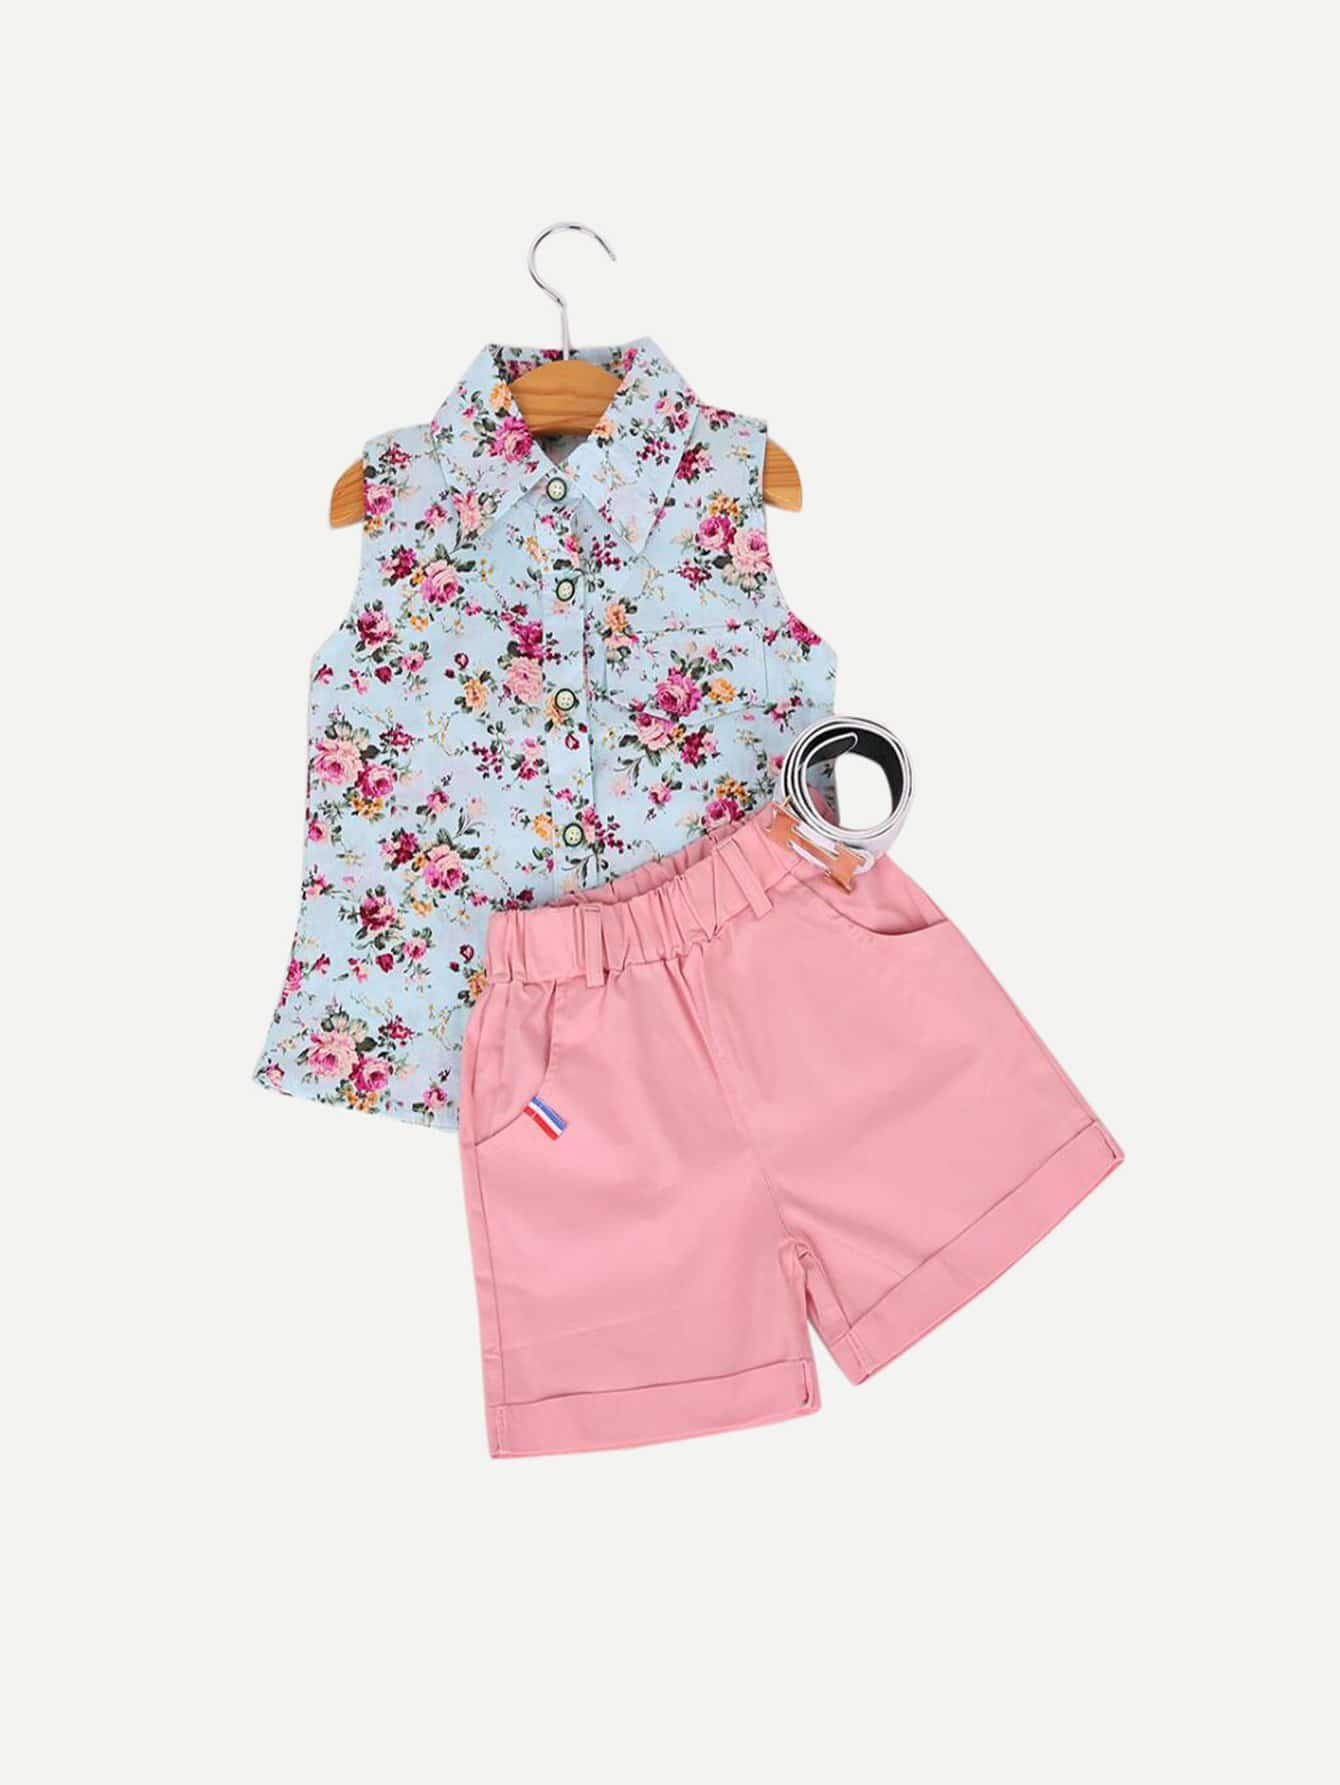 Kids Floral Print Vest With Rolled Hem Shorts rolled tbi original ballscrew sfk1002 length200mm with single nut